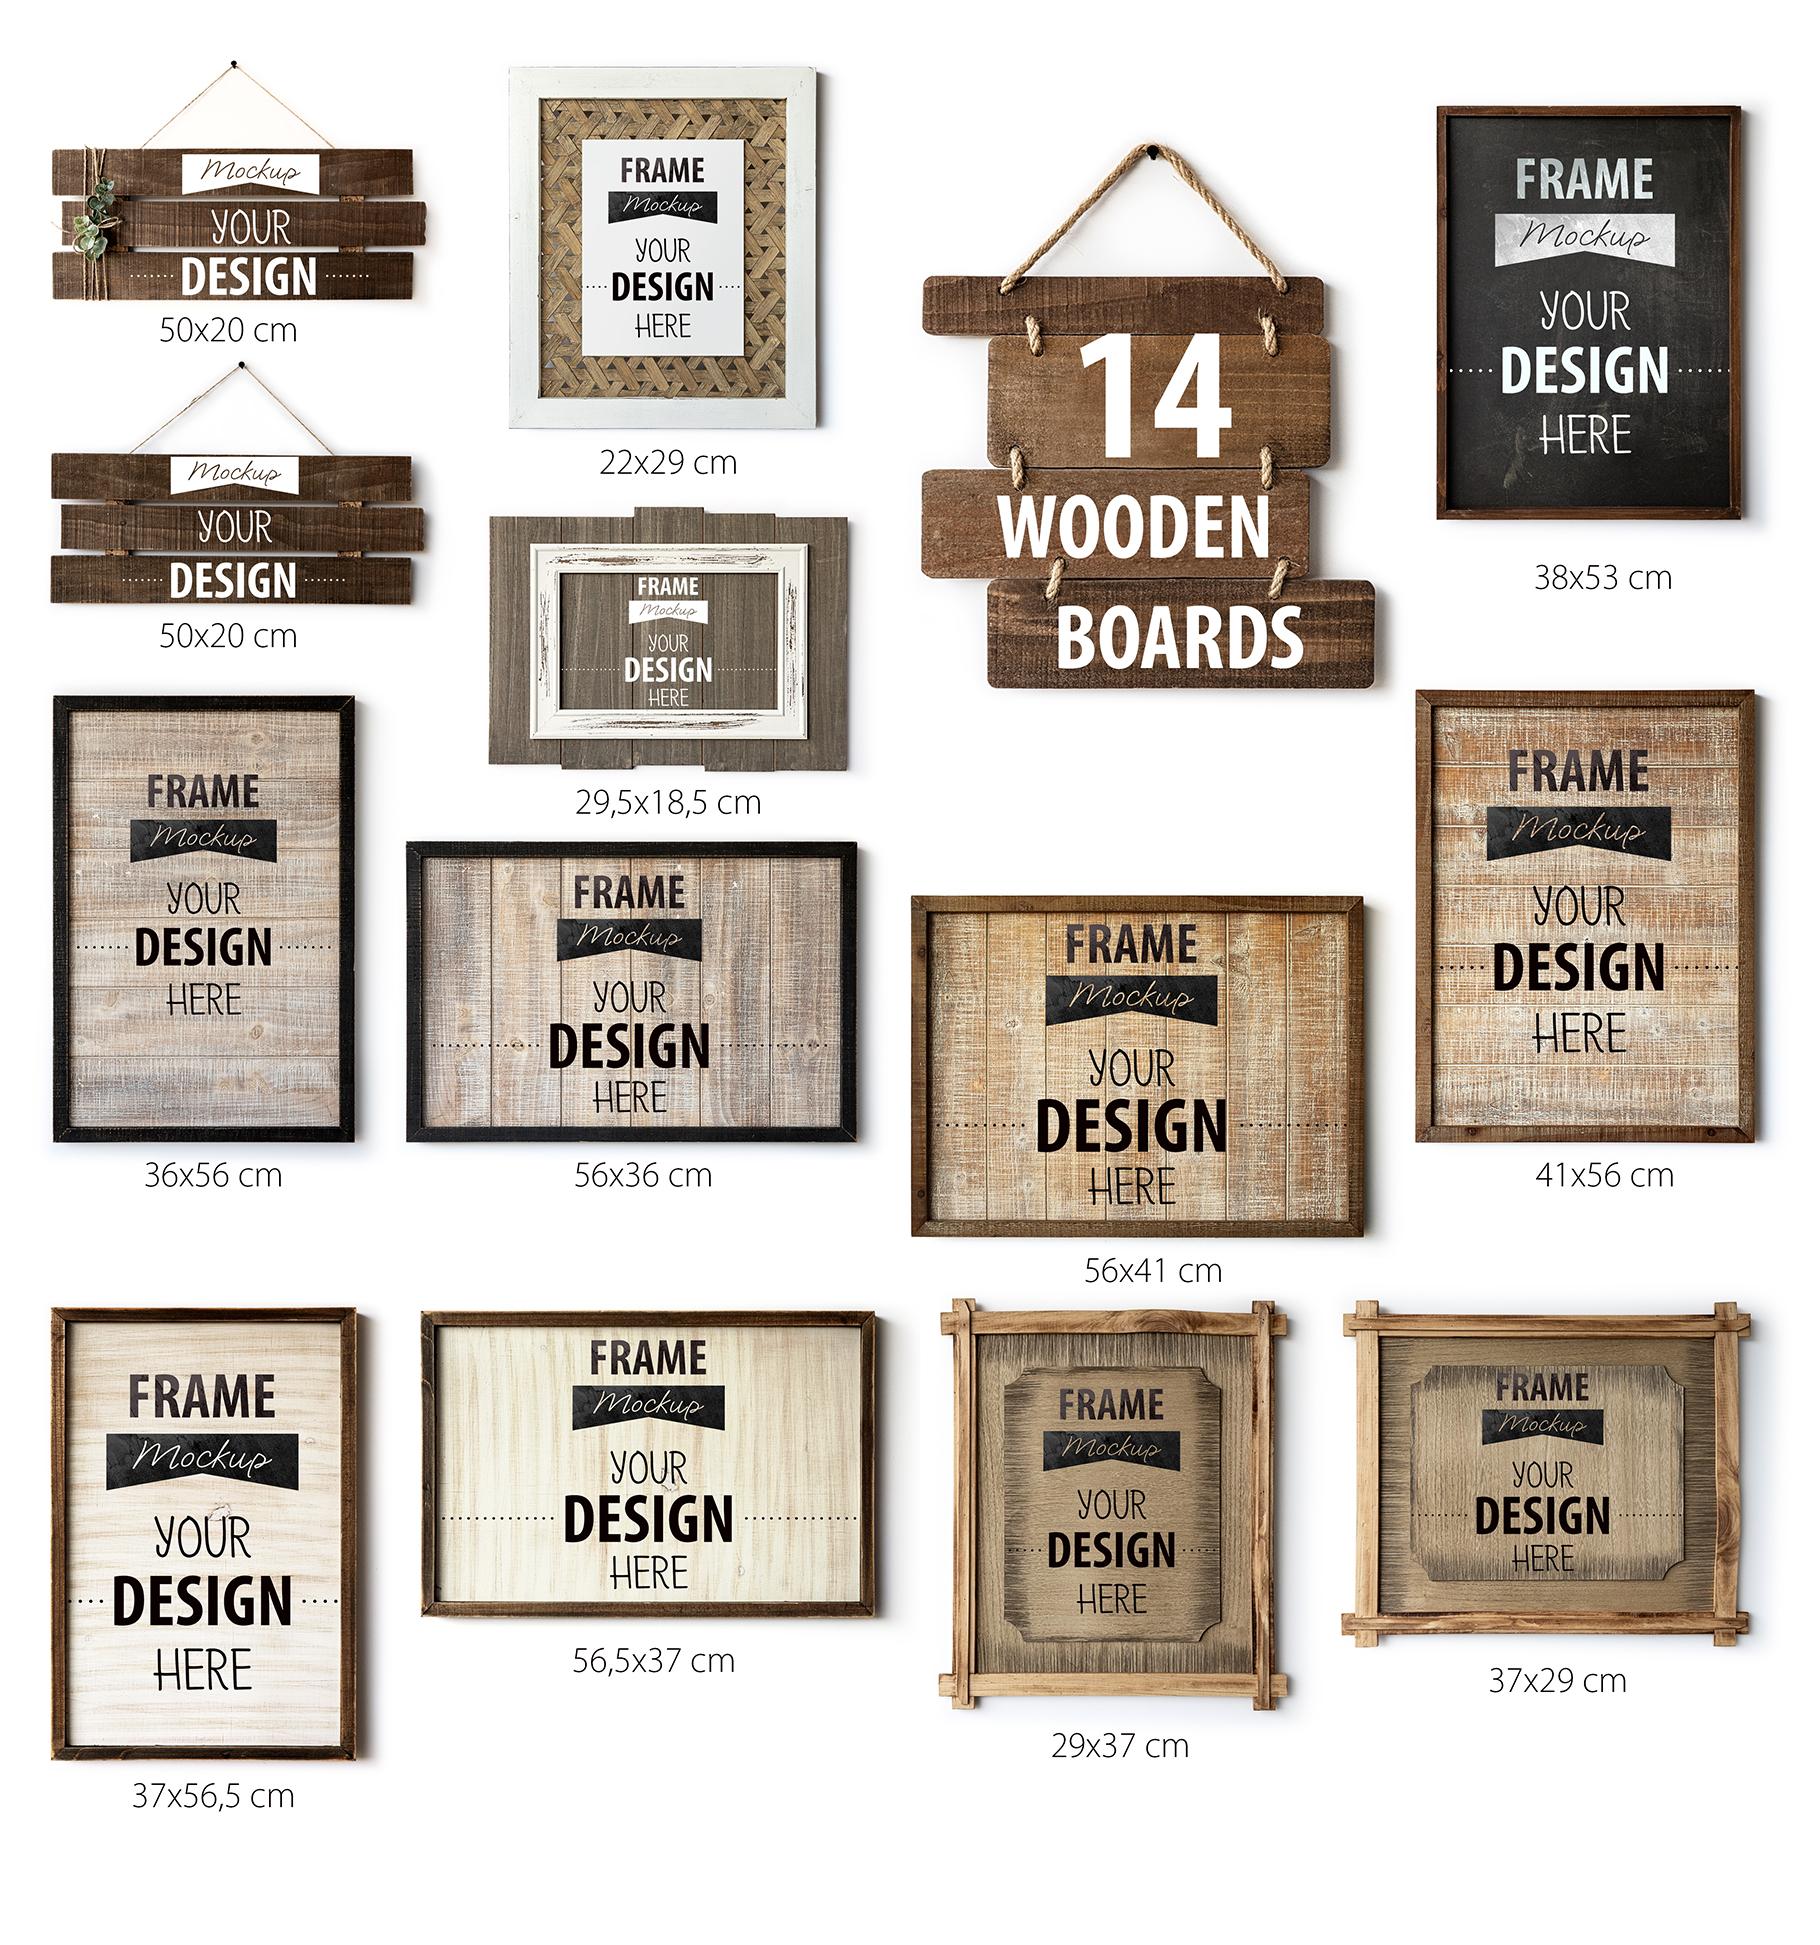 Scandinavian Interior Frames & Walls Mockup Bundle - 3 example image 6